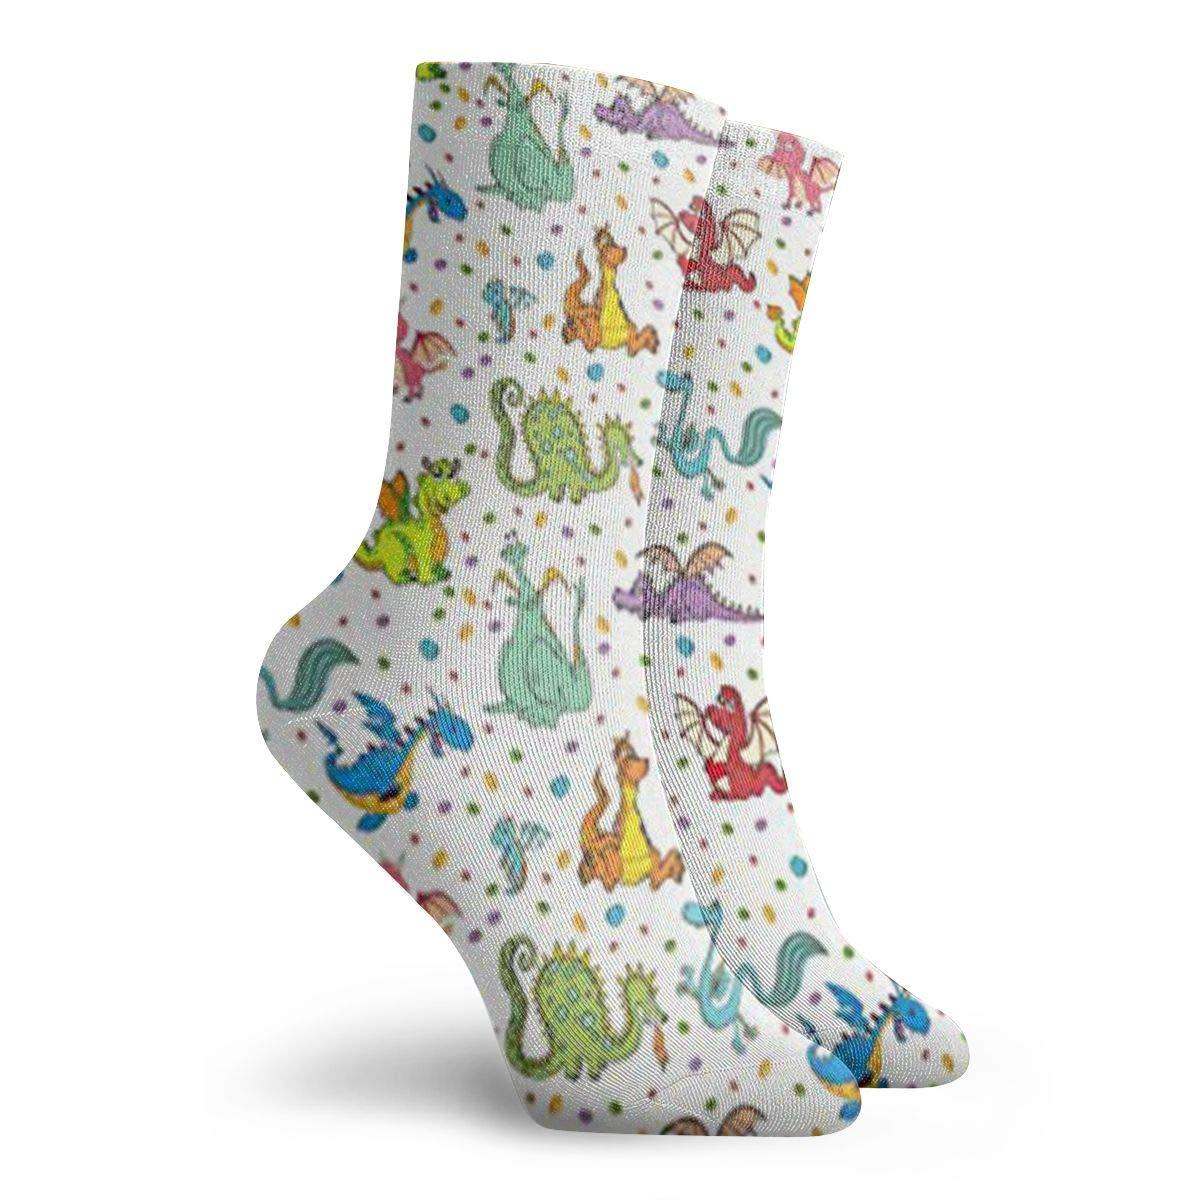 Dragons Unisex Funny Casual Crew Socks Athletic Socks For Boys Girls Kids Teenagers